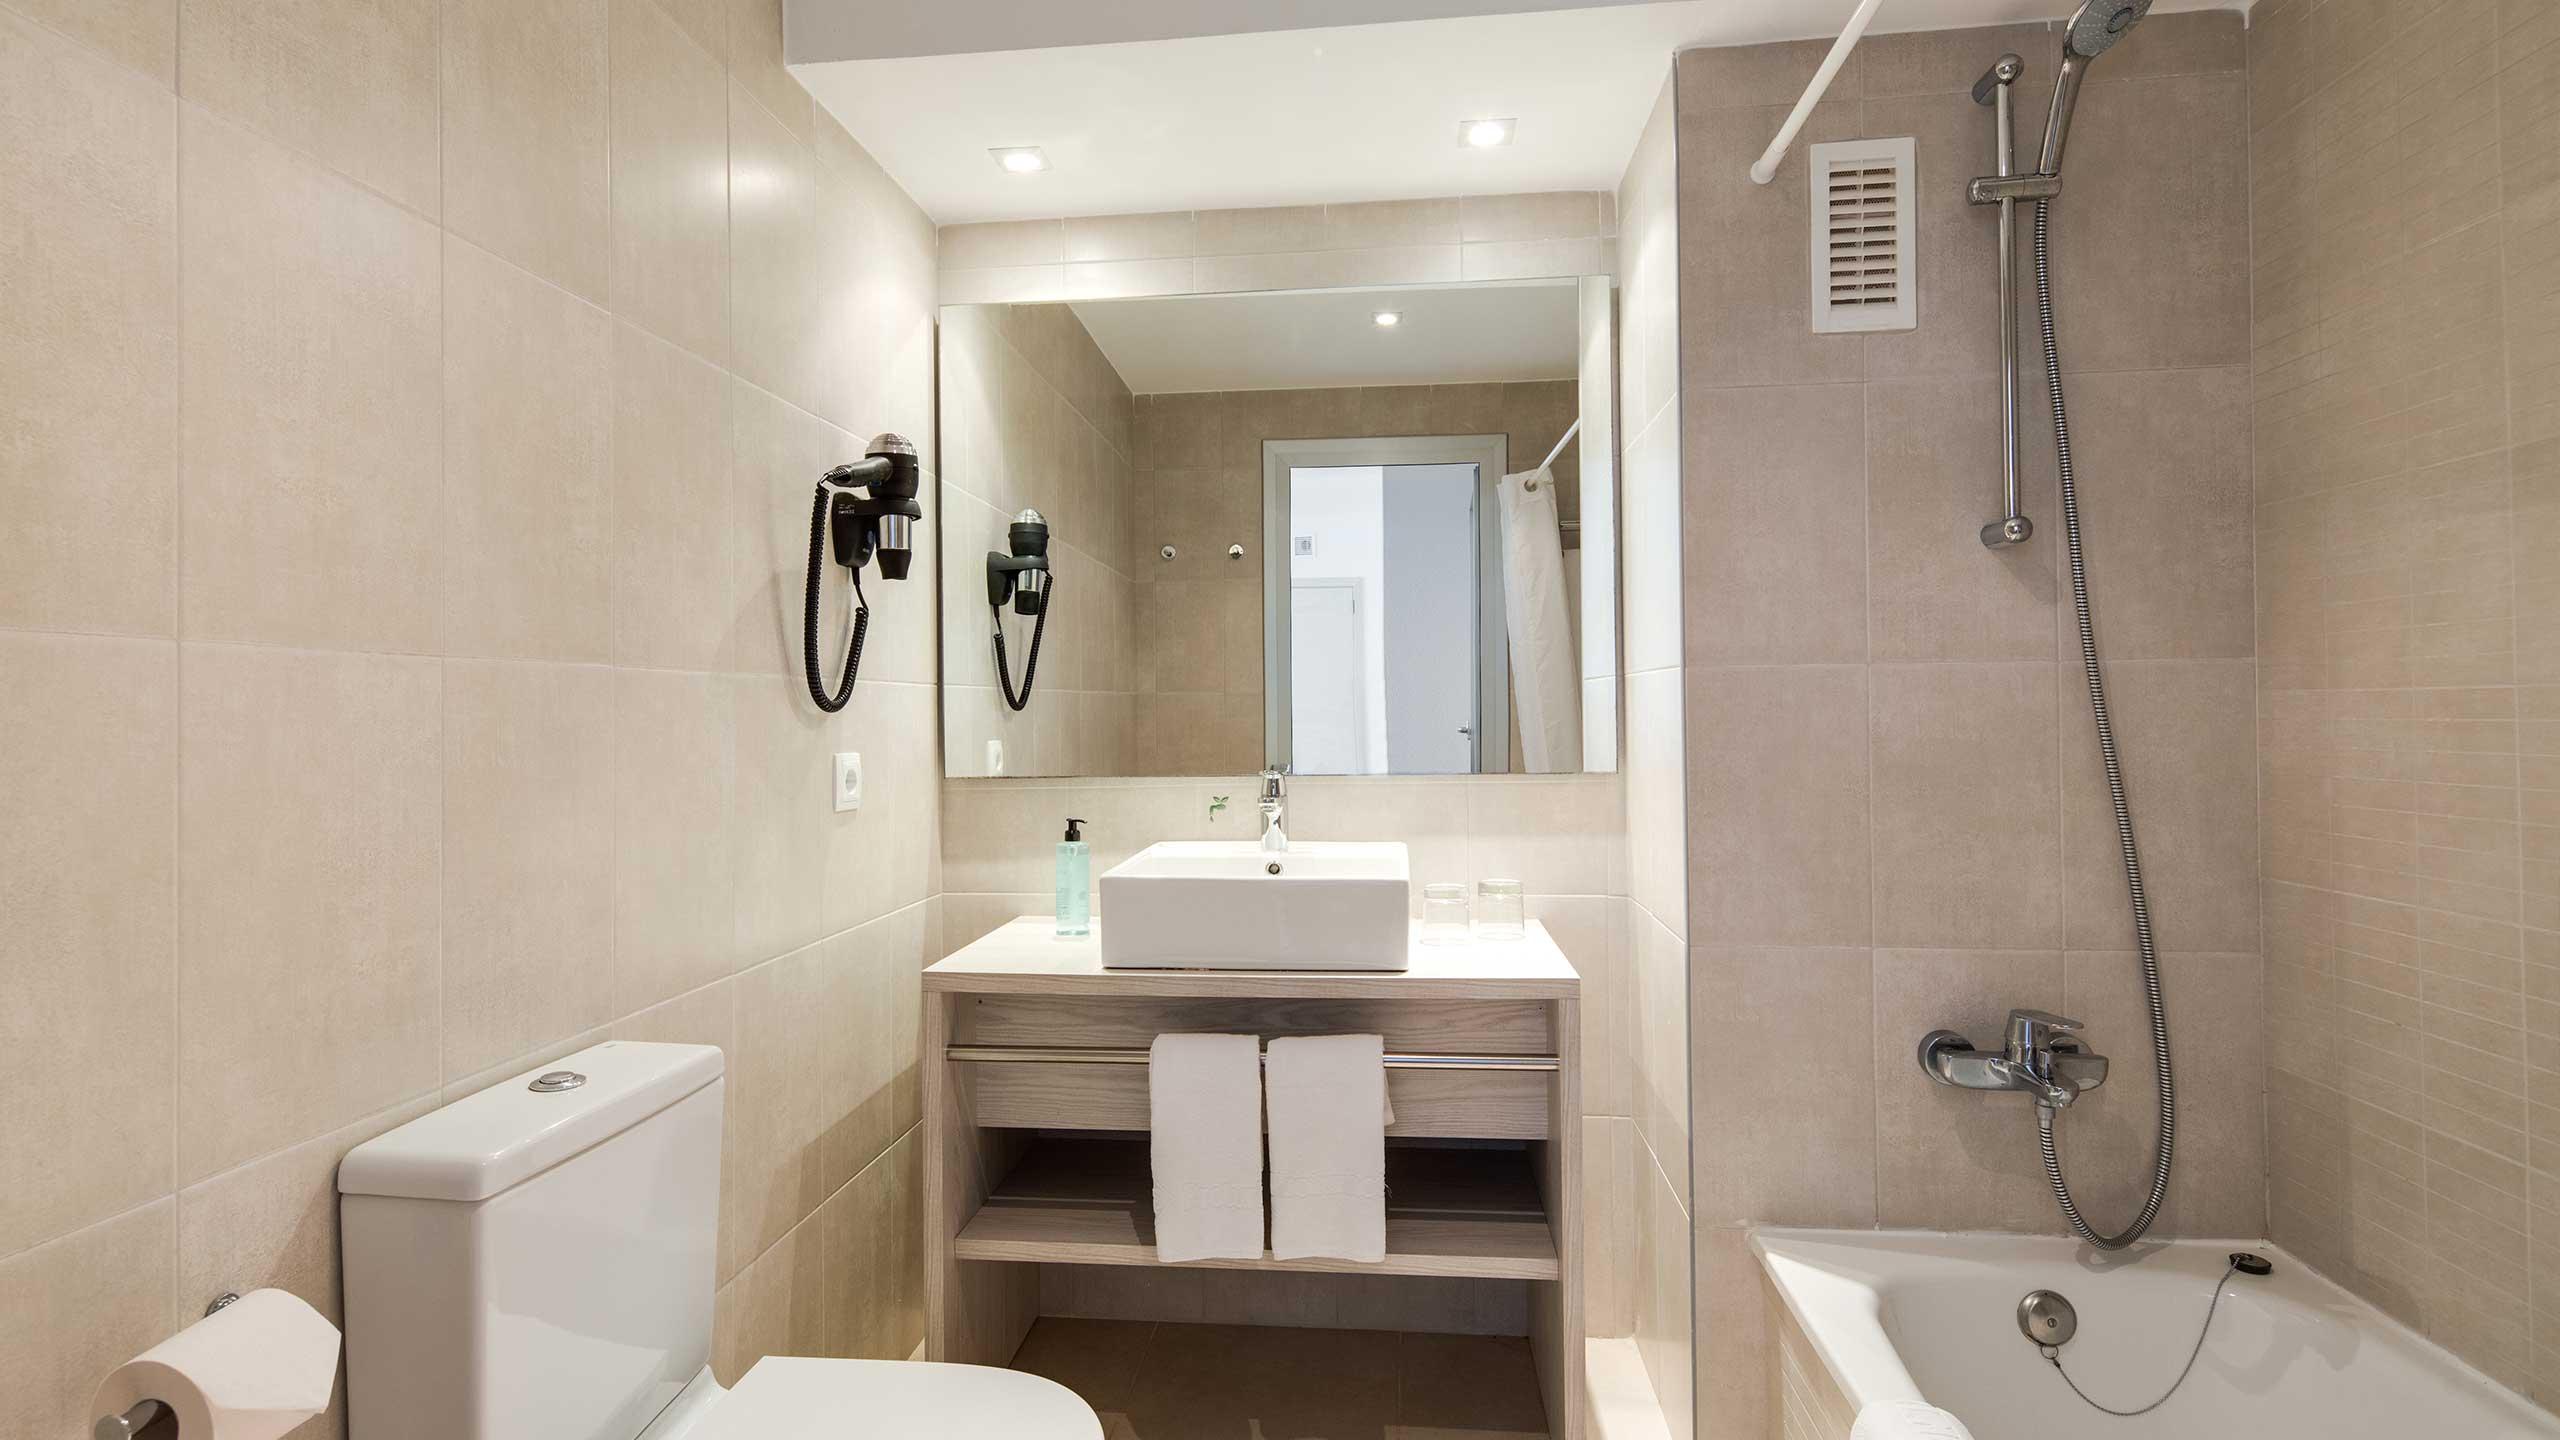 Rooms: Protur Safari Park Aparthotel In Sa Coma, Majorca